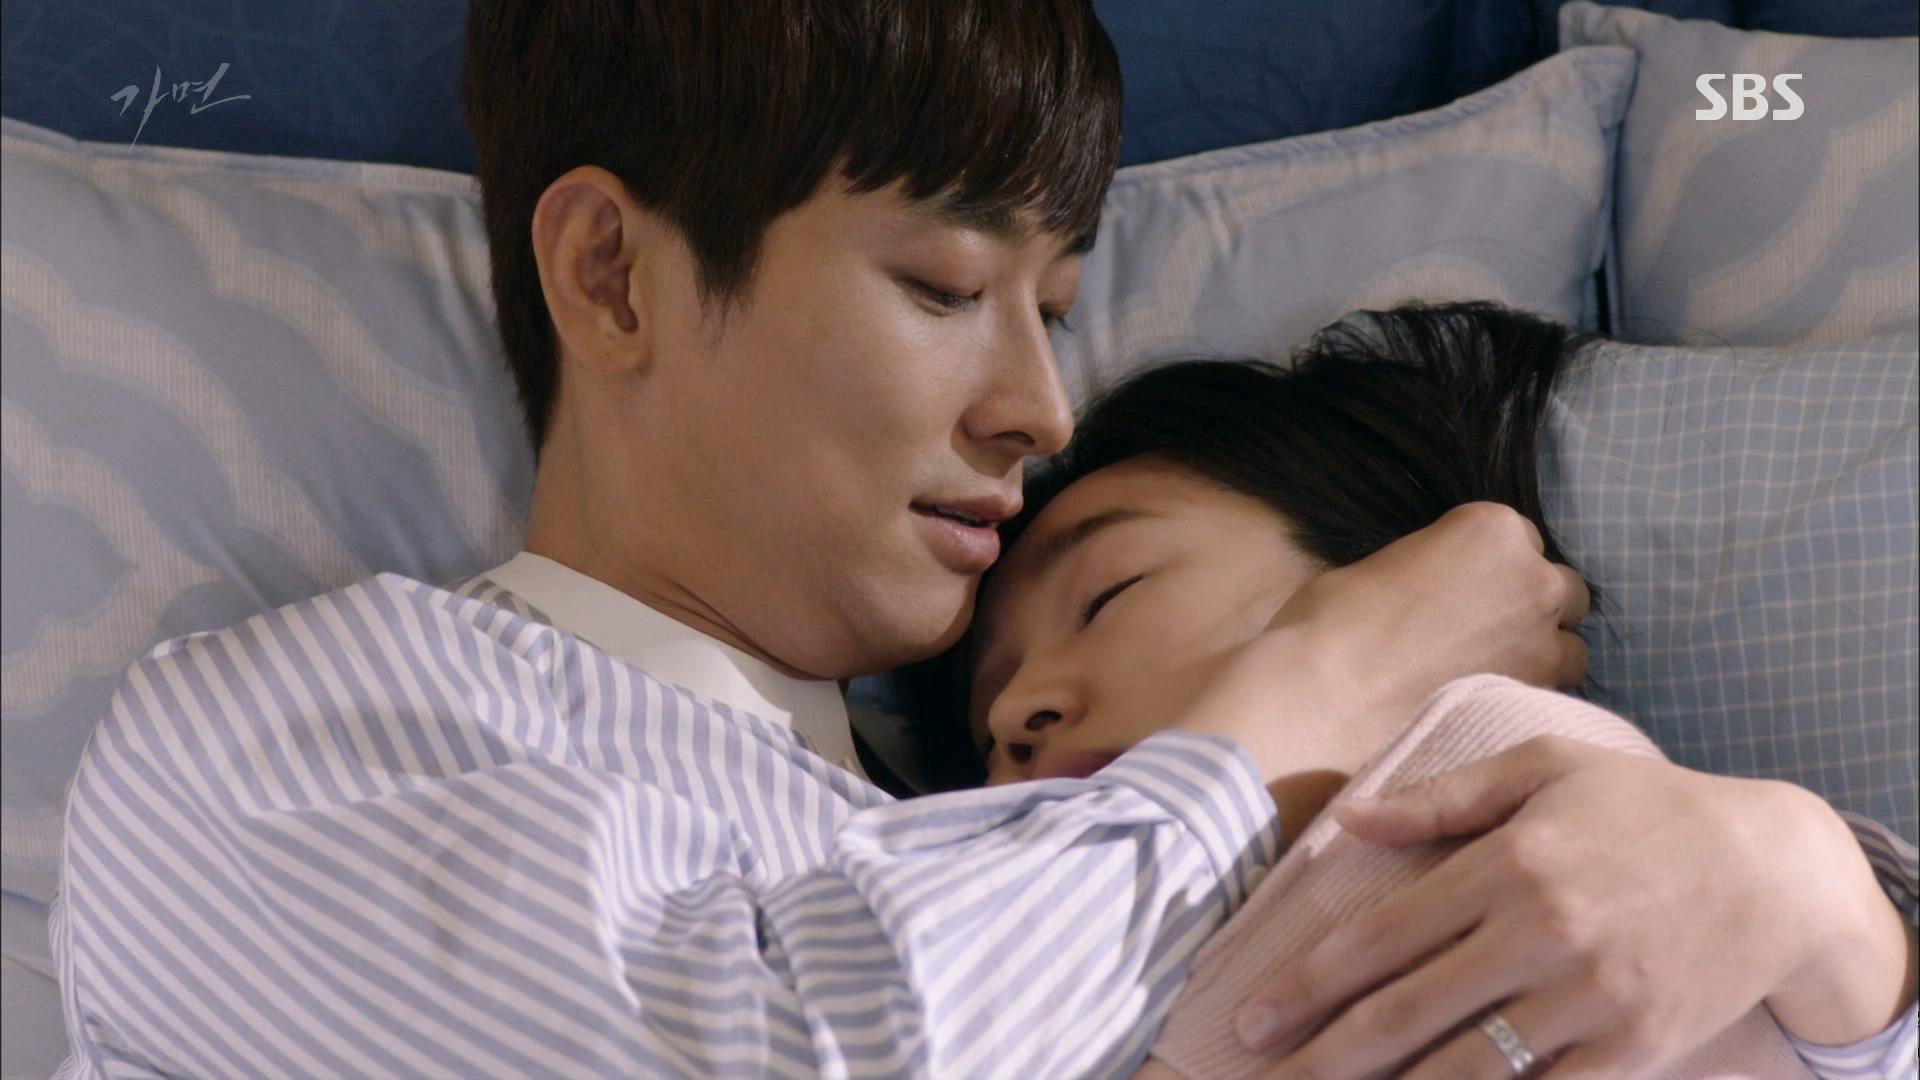 Mask episode 11 2015 - Mask Episode 17 Watch Full Episodes Free Korea Tv Shows Rakuten Viki